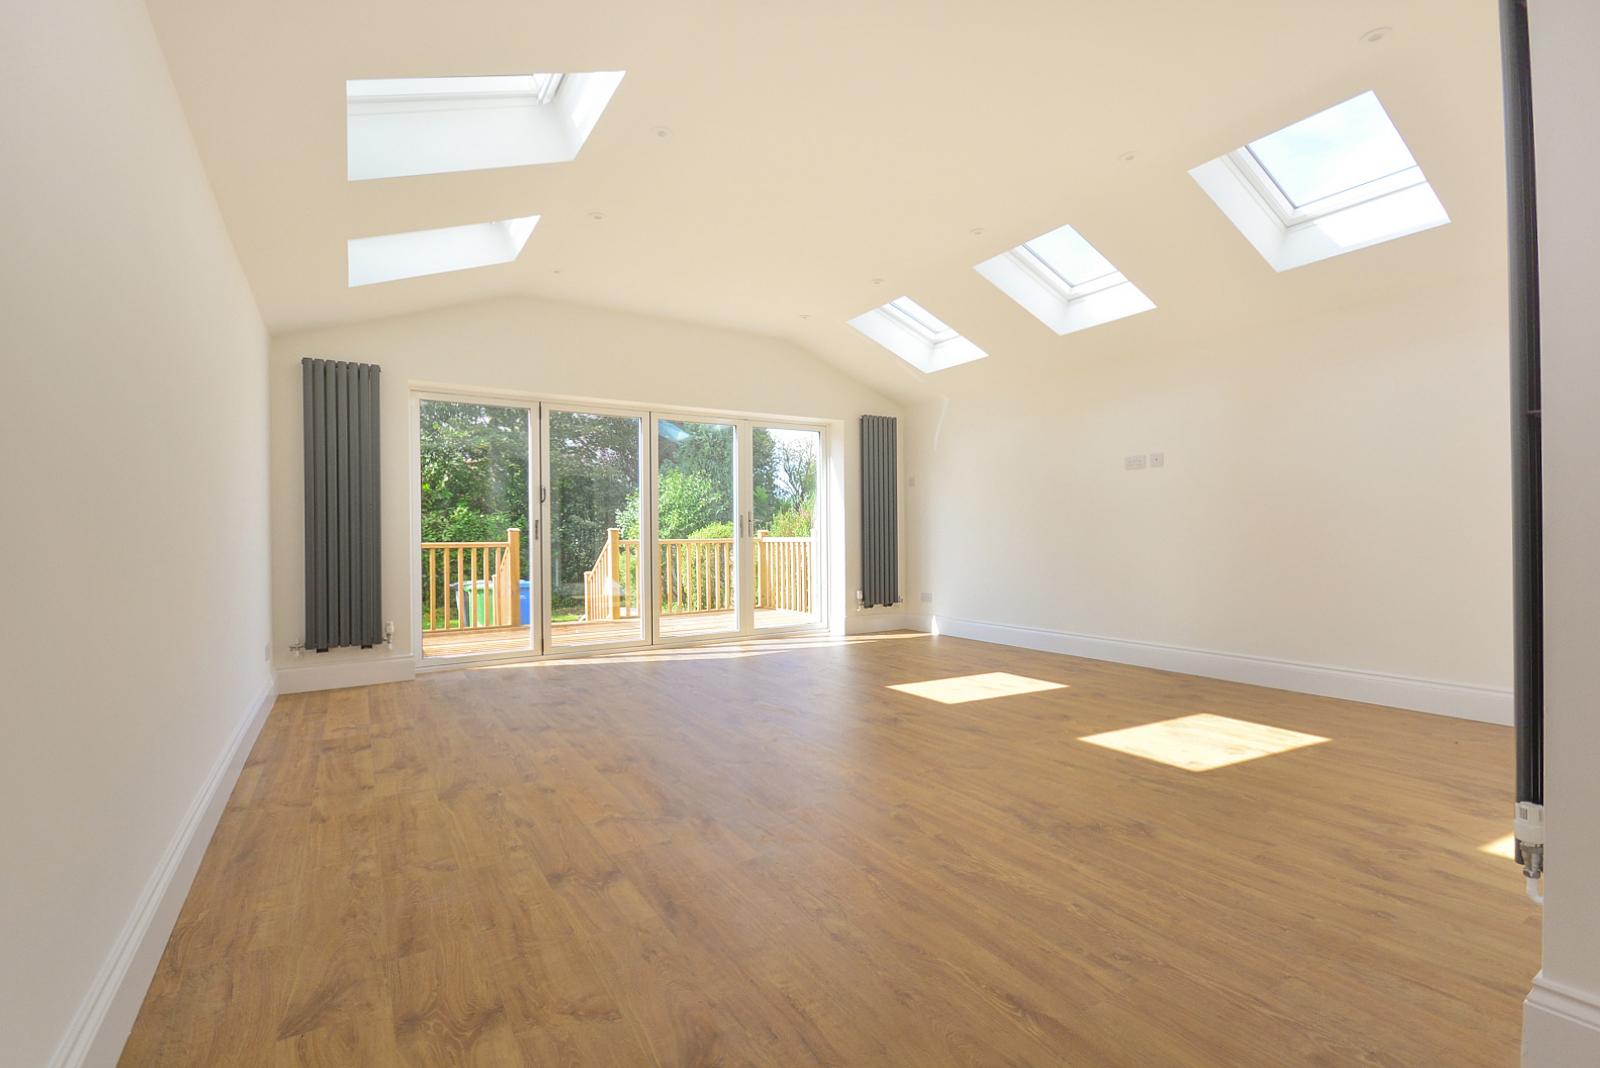 3 Bedroom House For Sale In Warrington